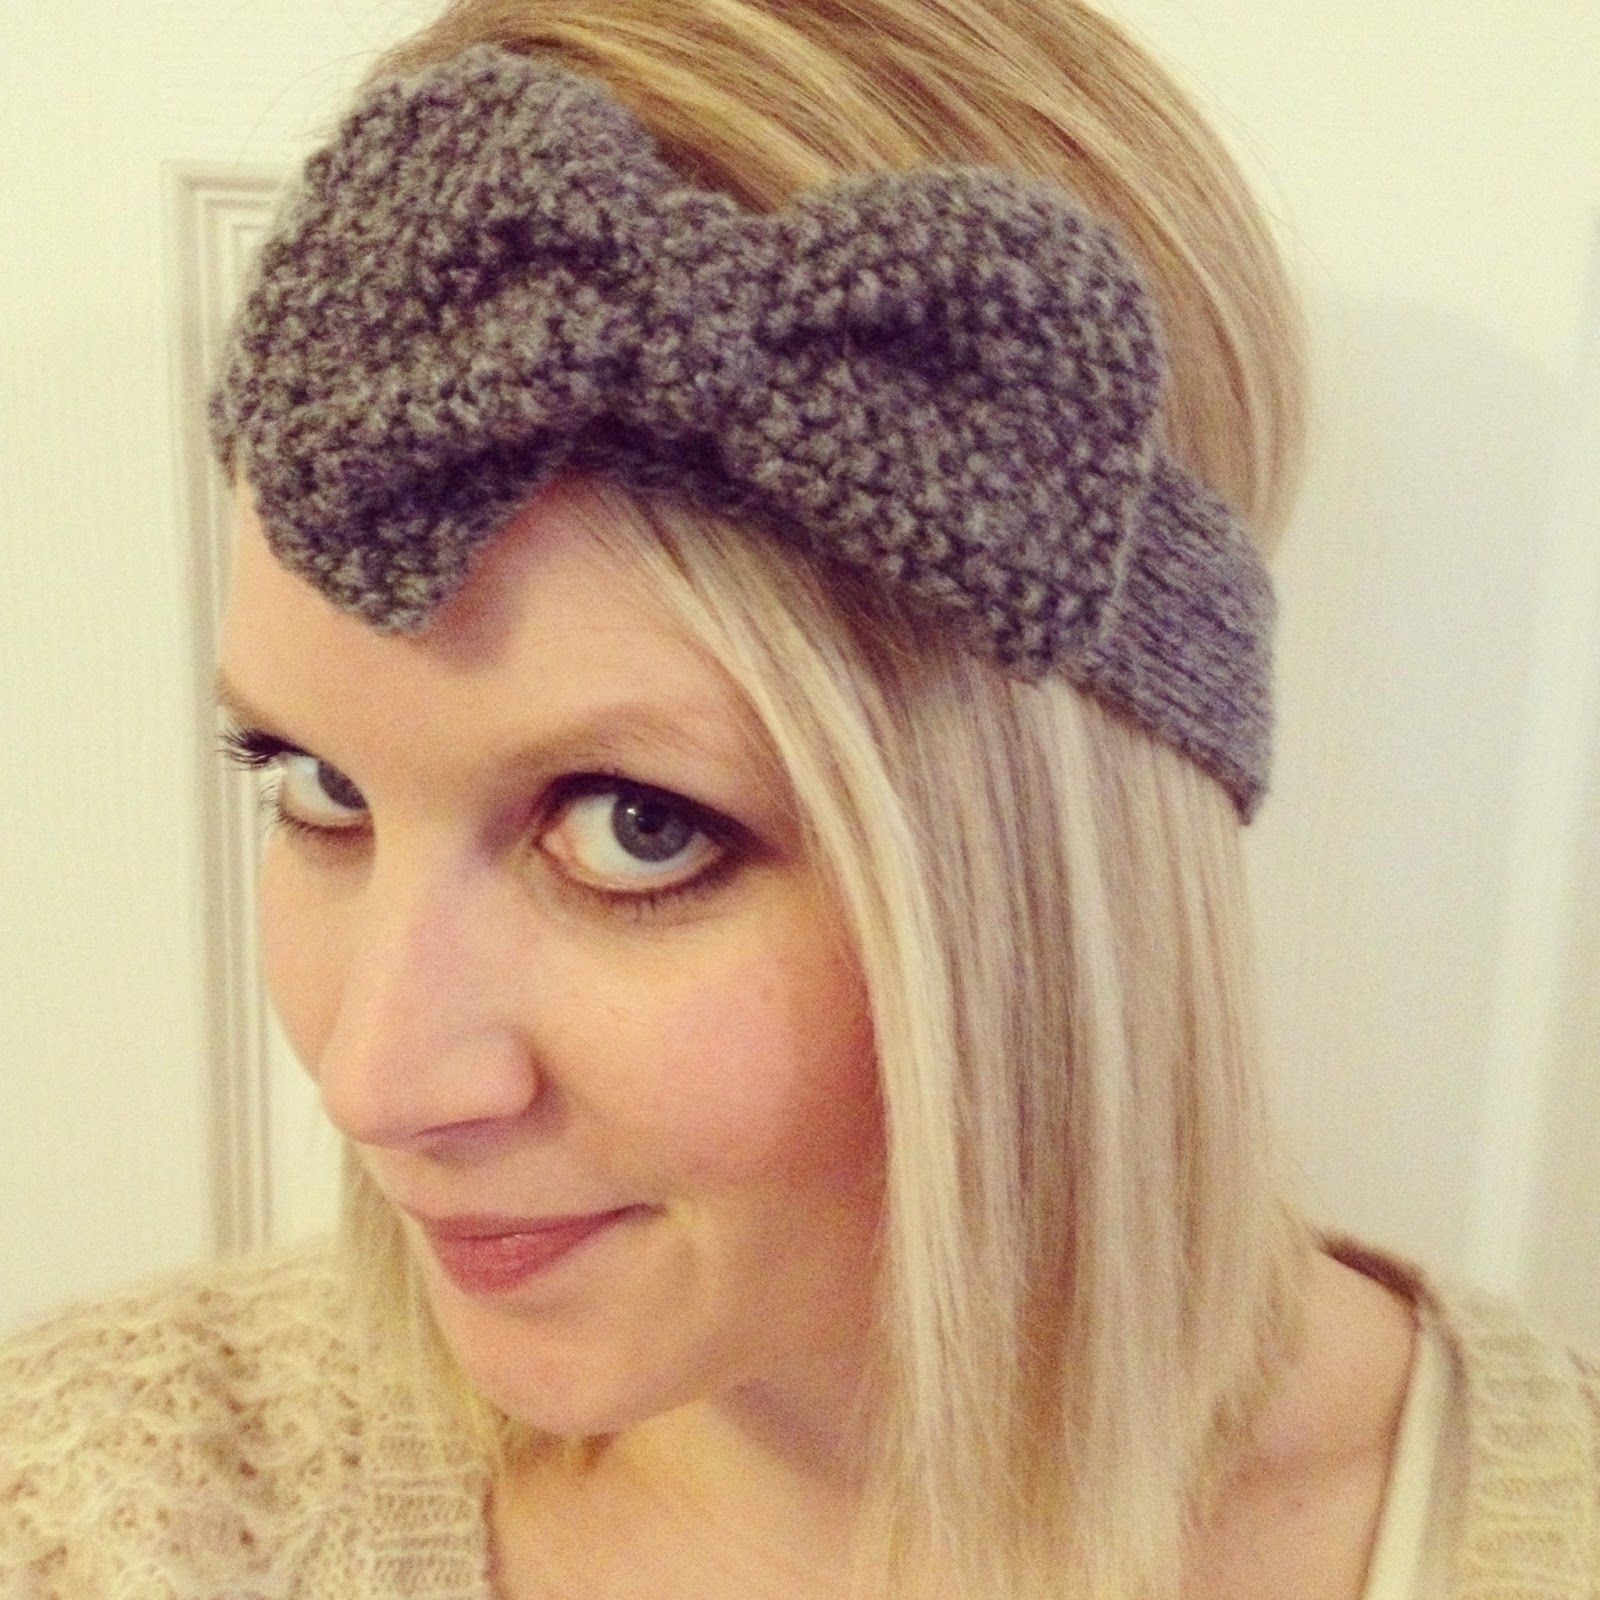 Easy+Knit+Headband+Free+Pattern | ... & Lifestyle Blog: My First ...